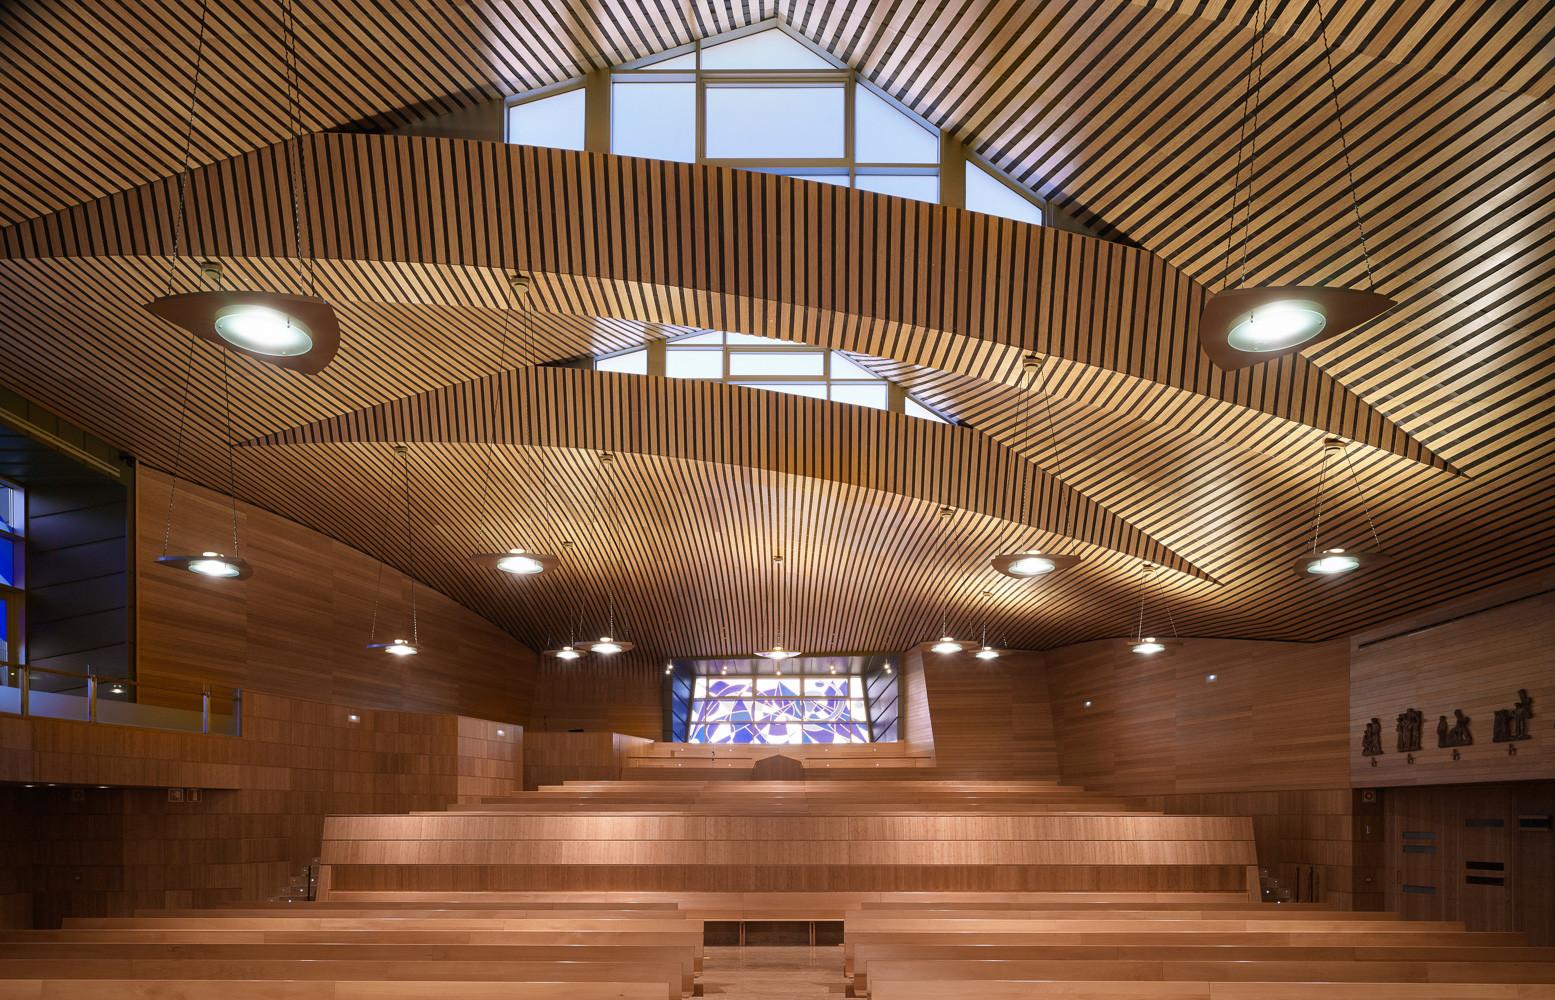 Oratory And Auditorium Retamar School Artytech2 Archdaily